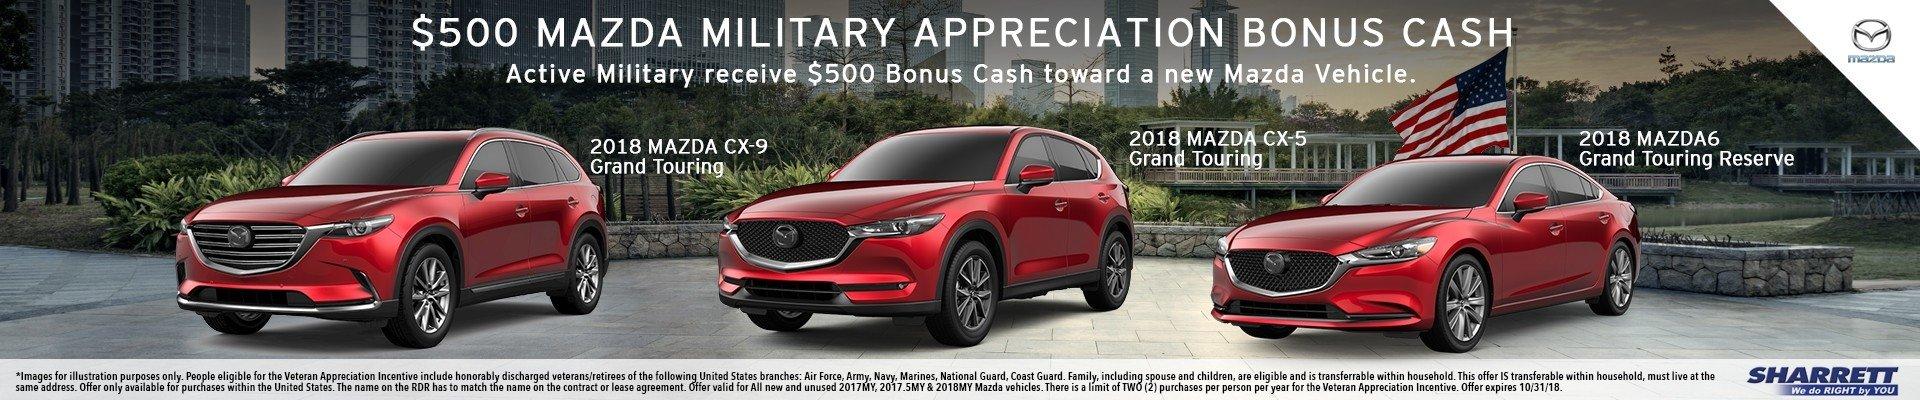 Mazda Military Veterans Appreciation